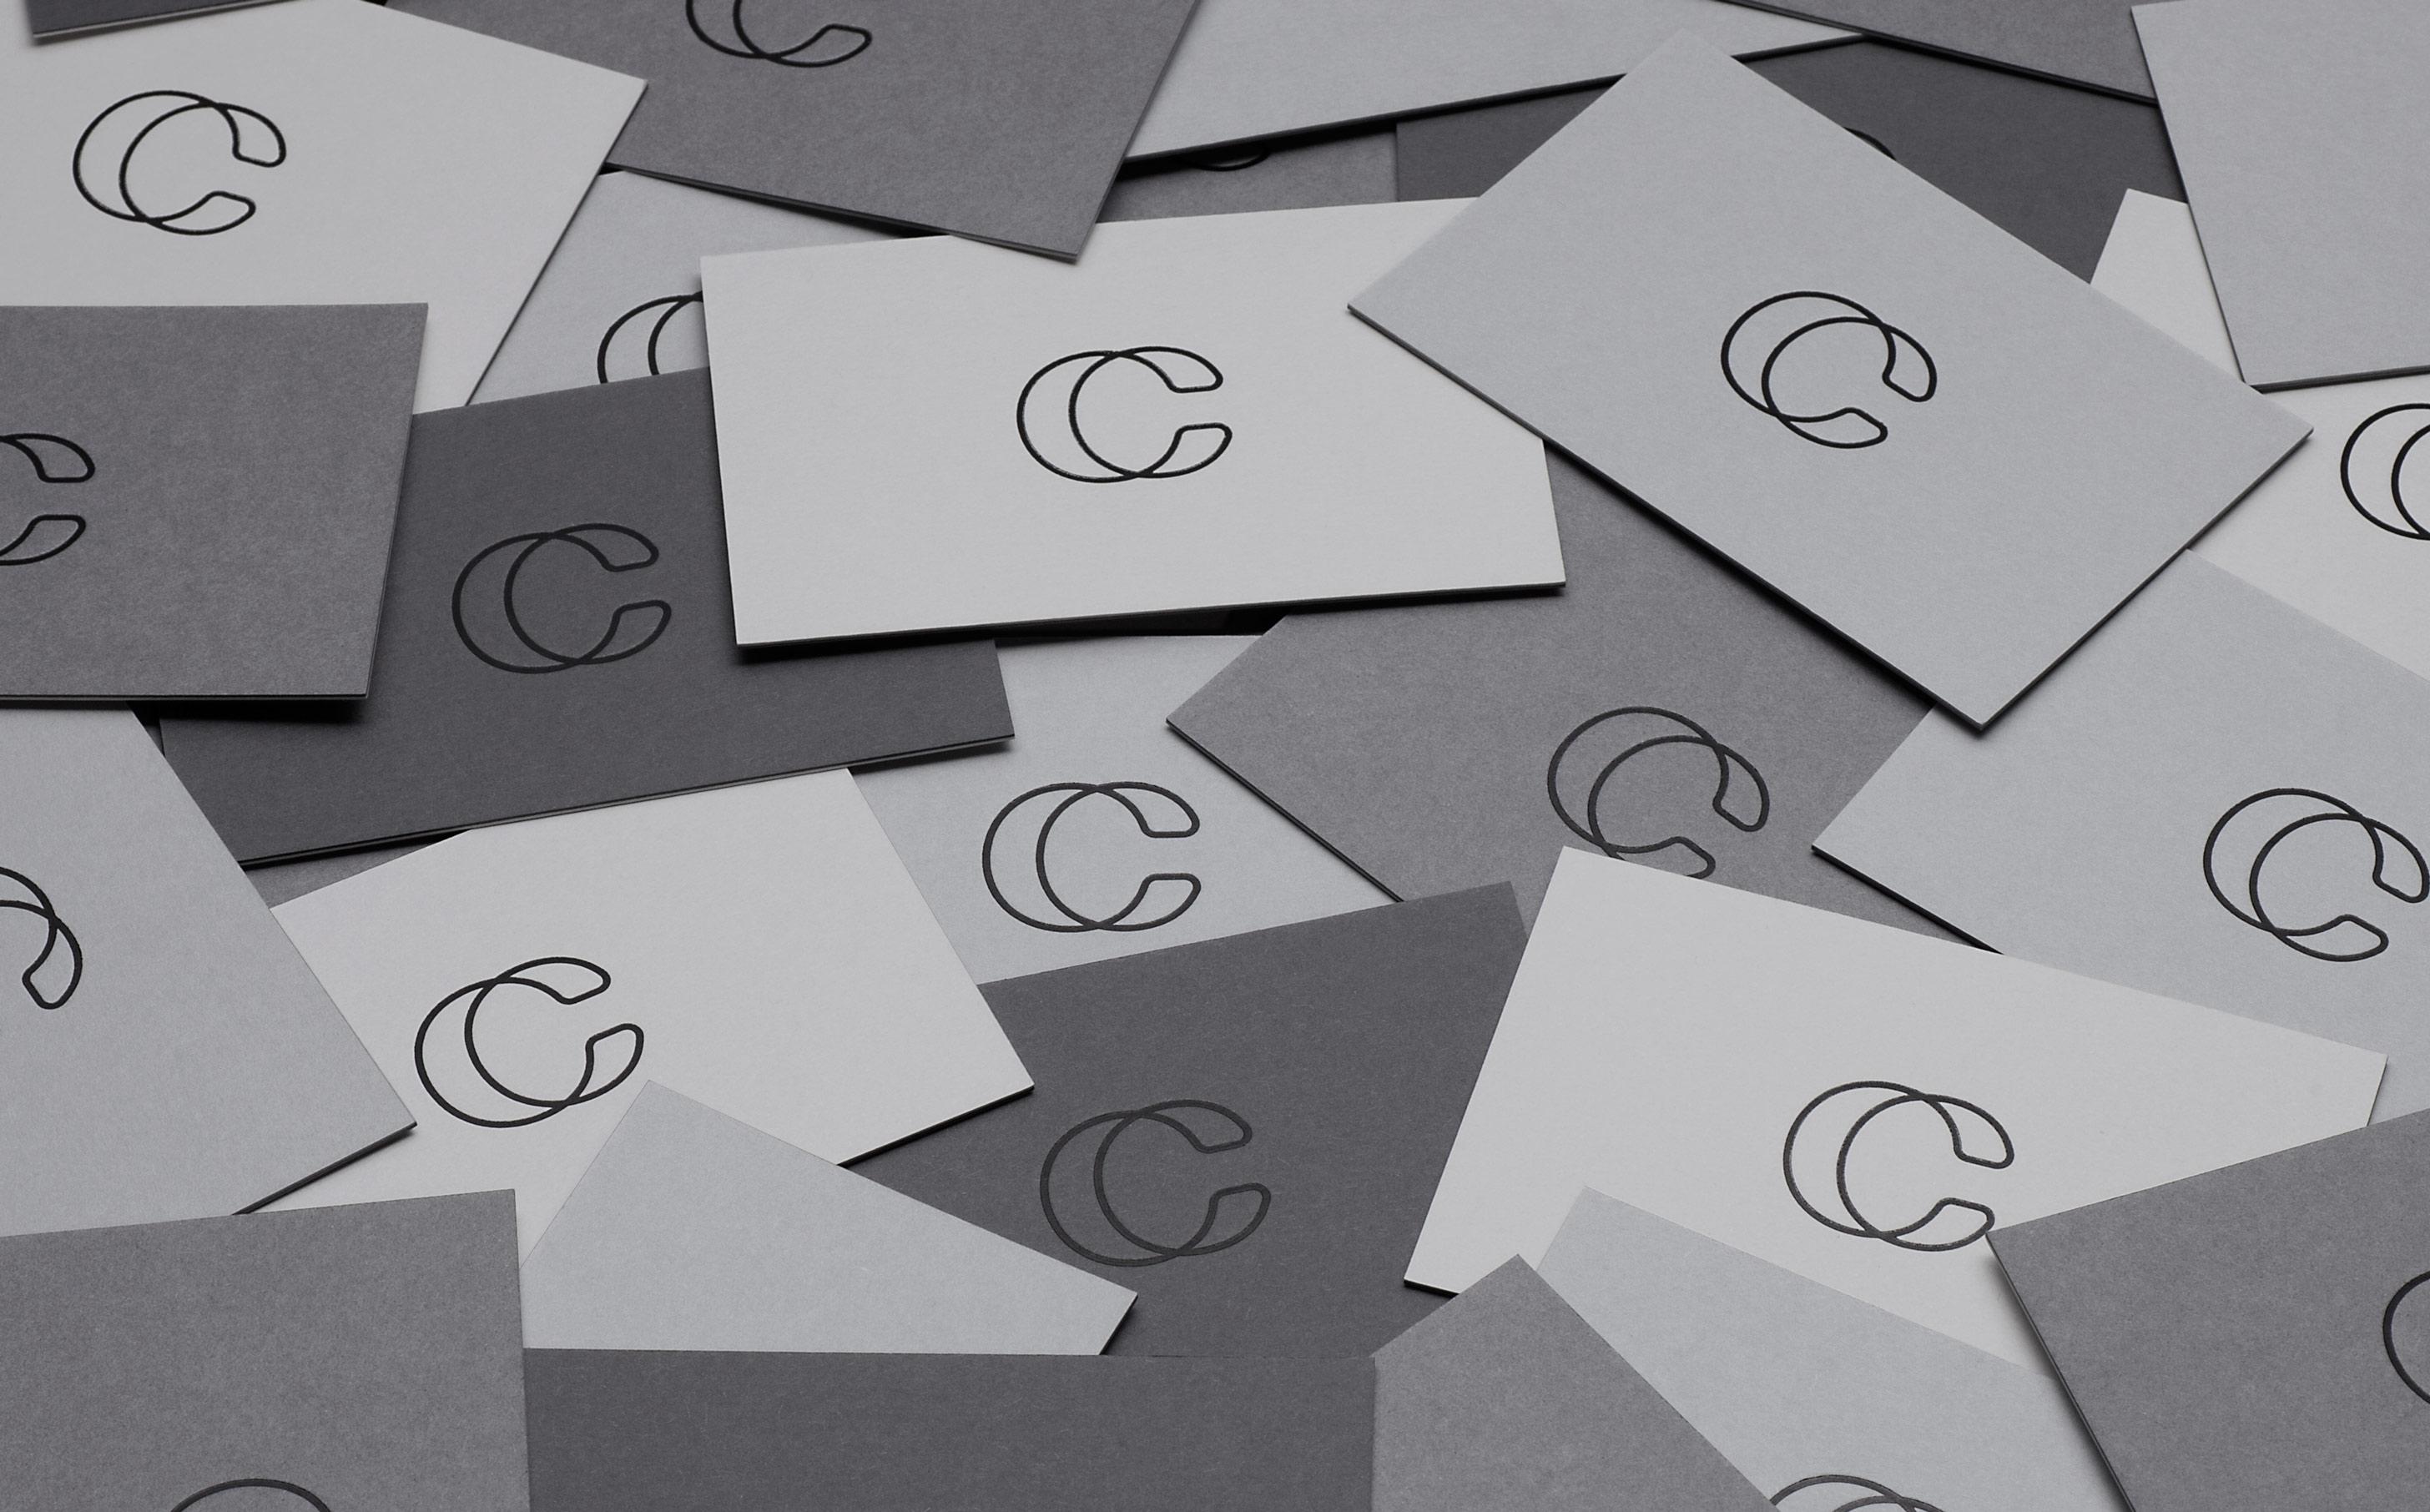 Business-card-design-crix-capital-london-04